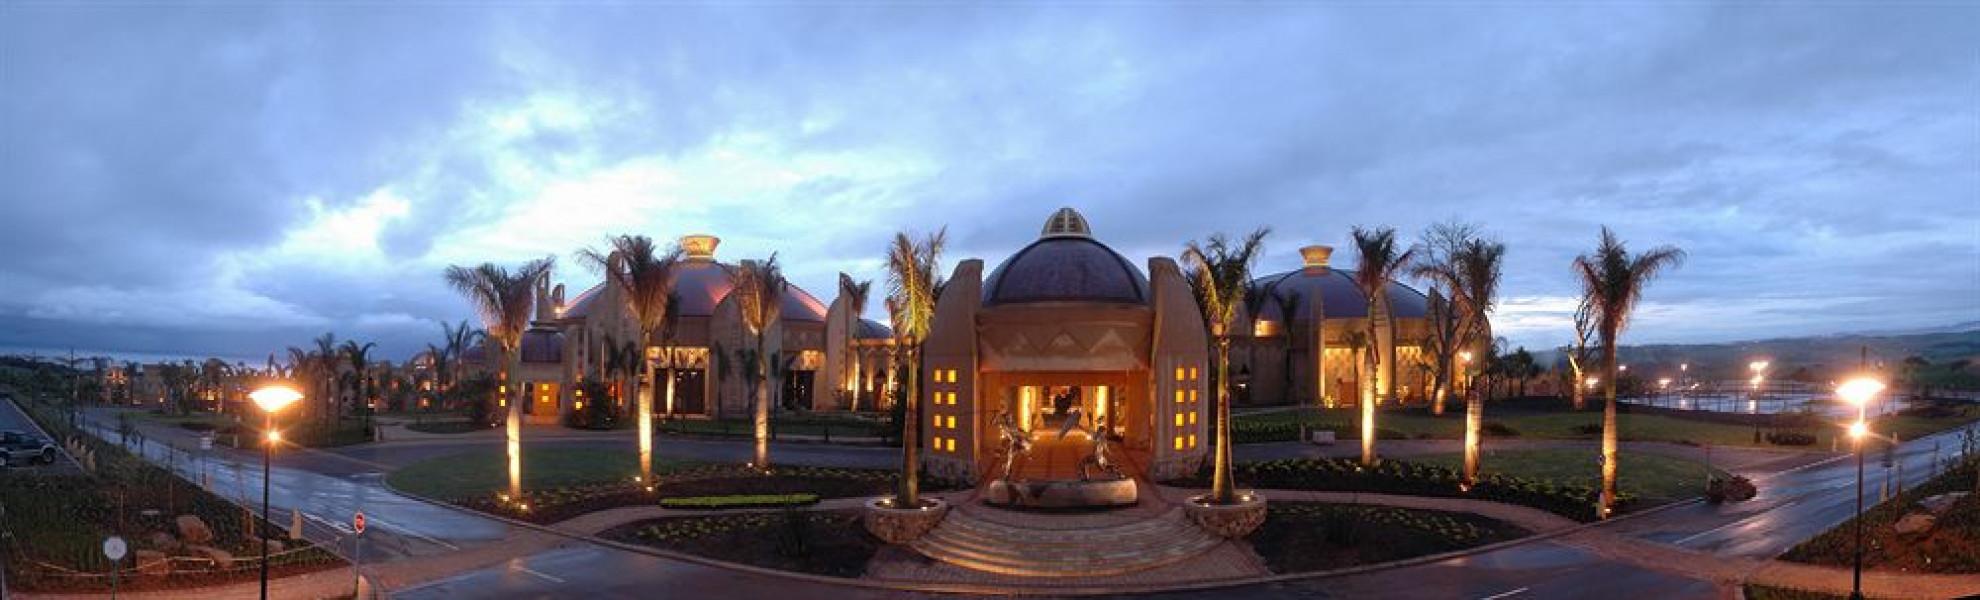 sibaya casino durban vacancies